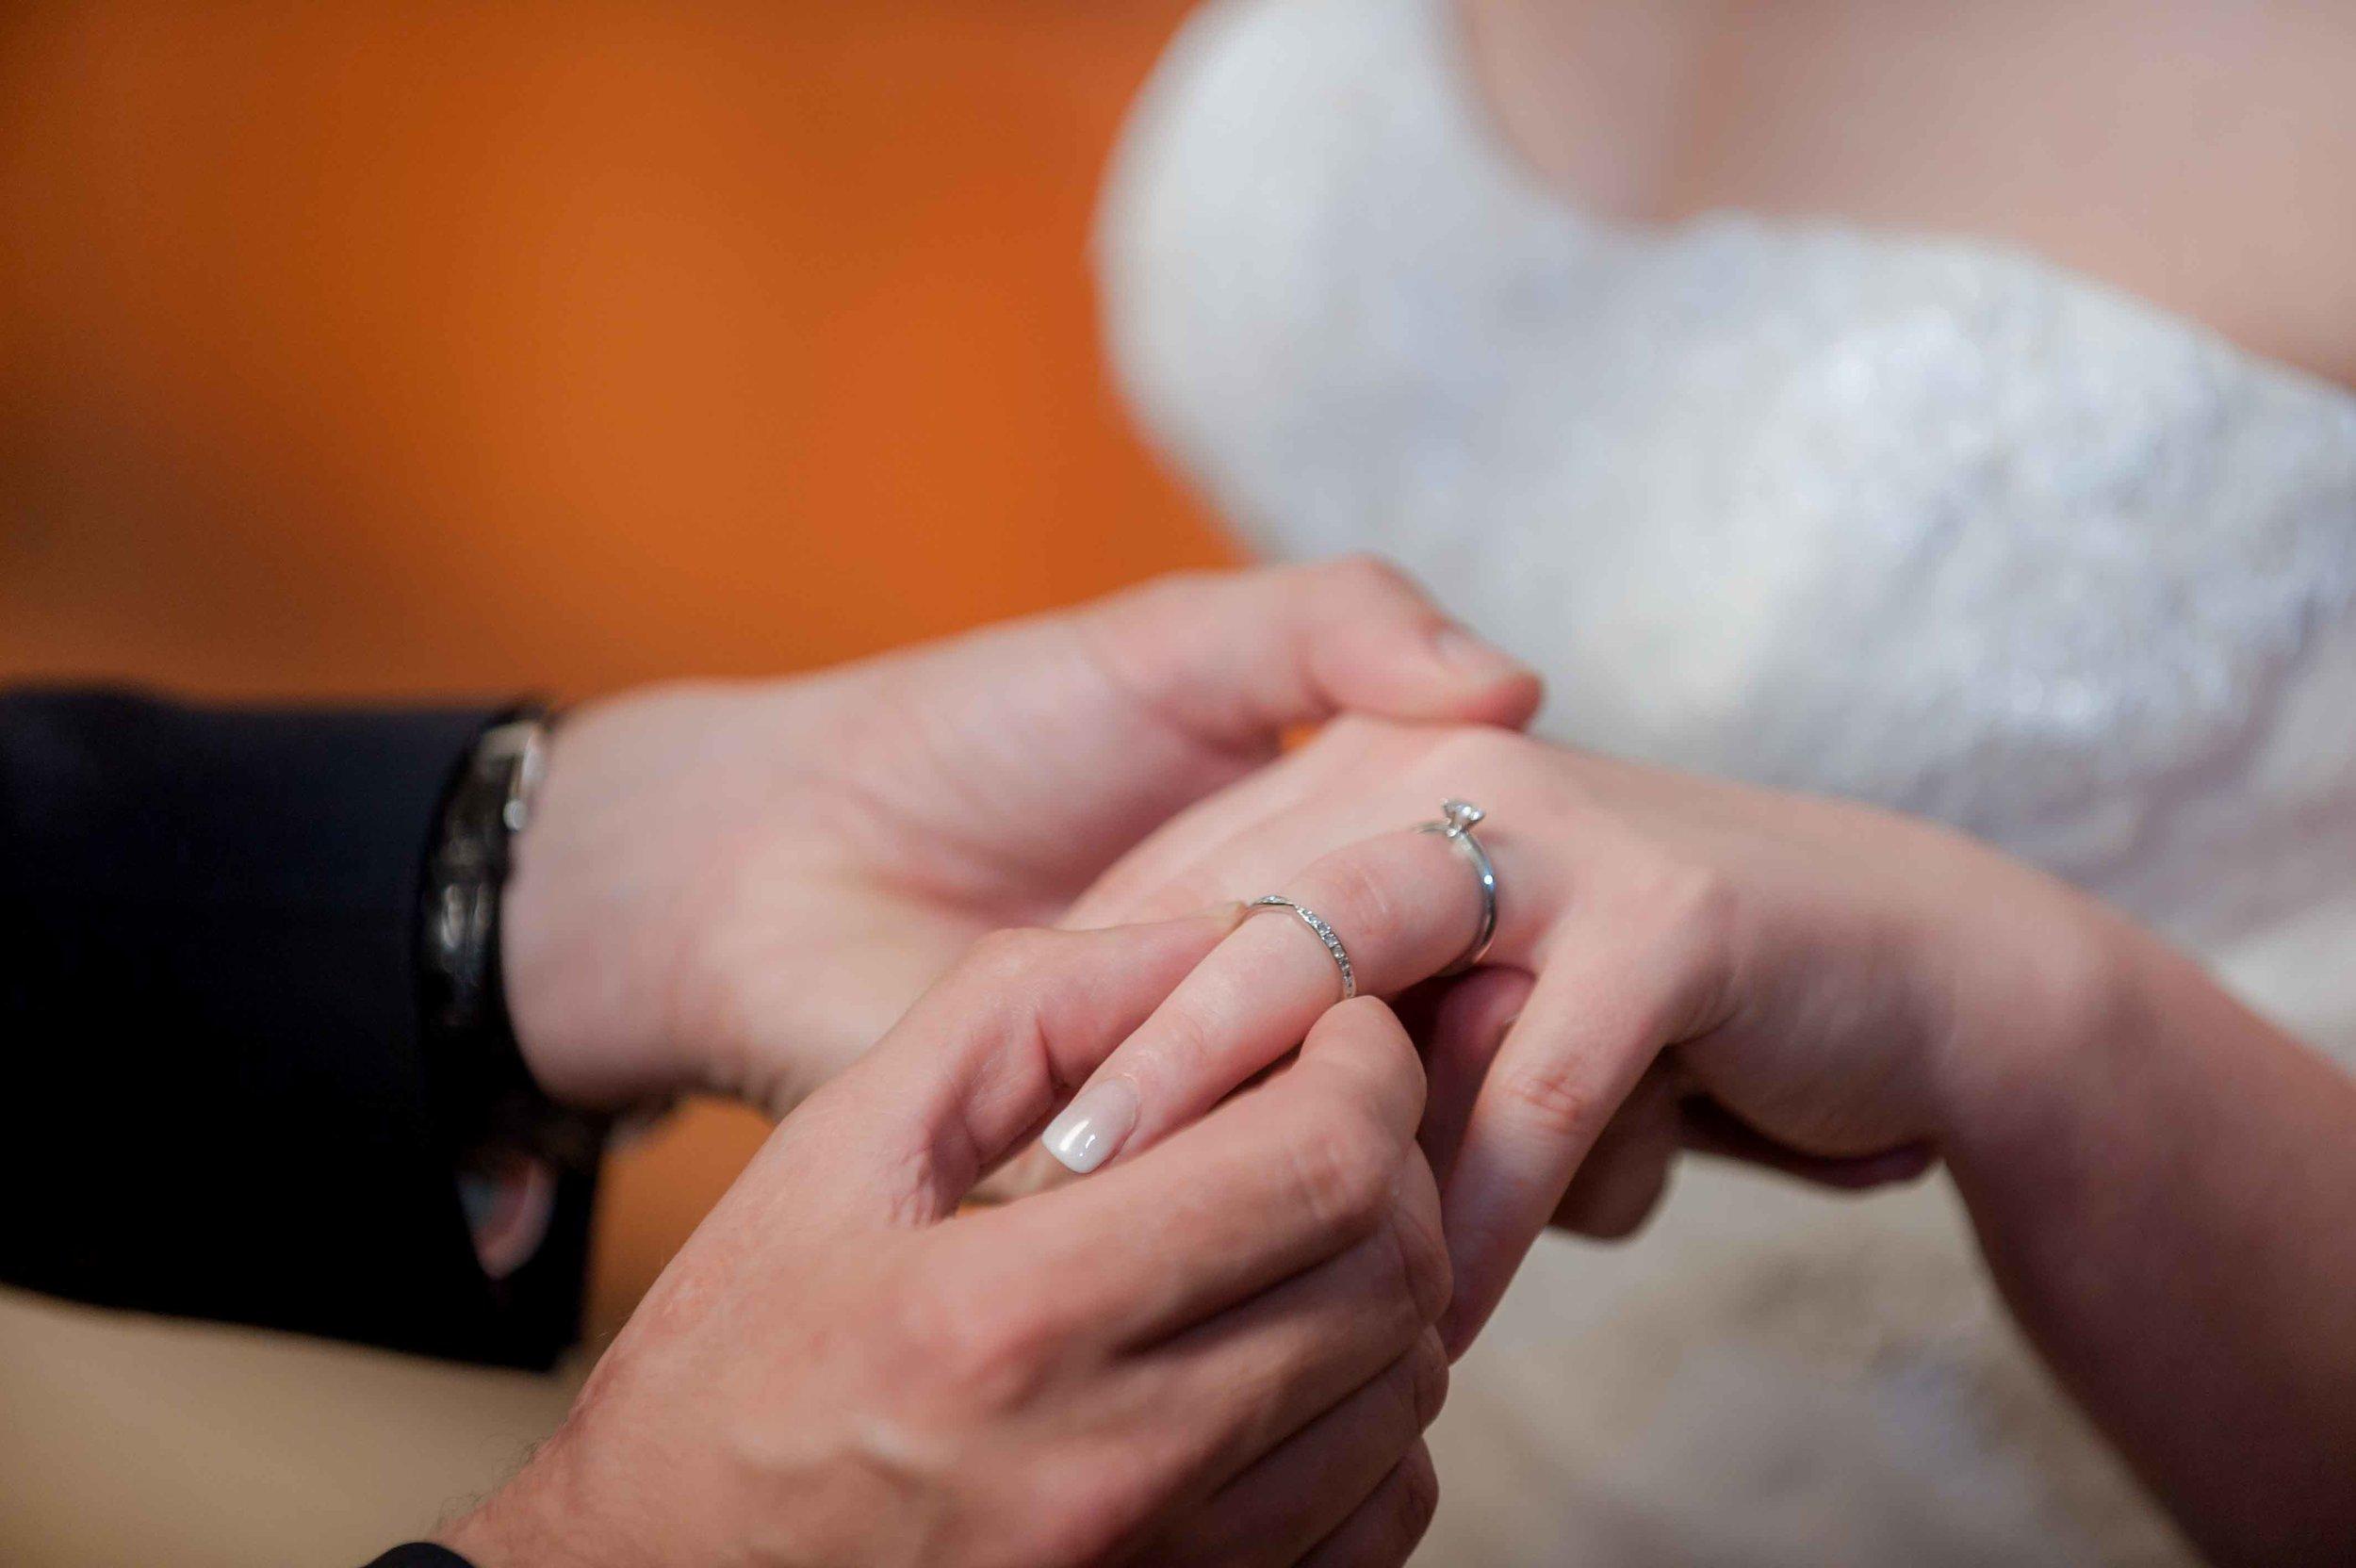 Adrian_Nicole_Charnwood_Weddings_Queens_College_Cambridge-1023.jpg